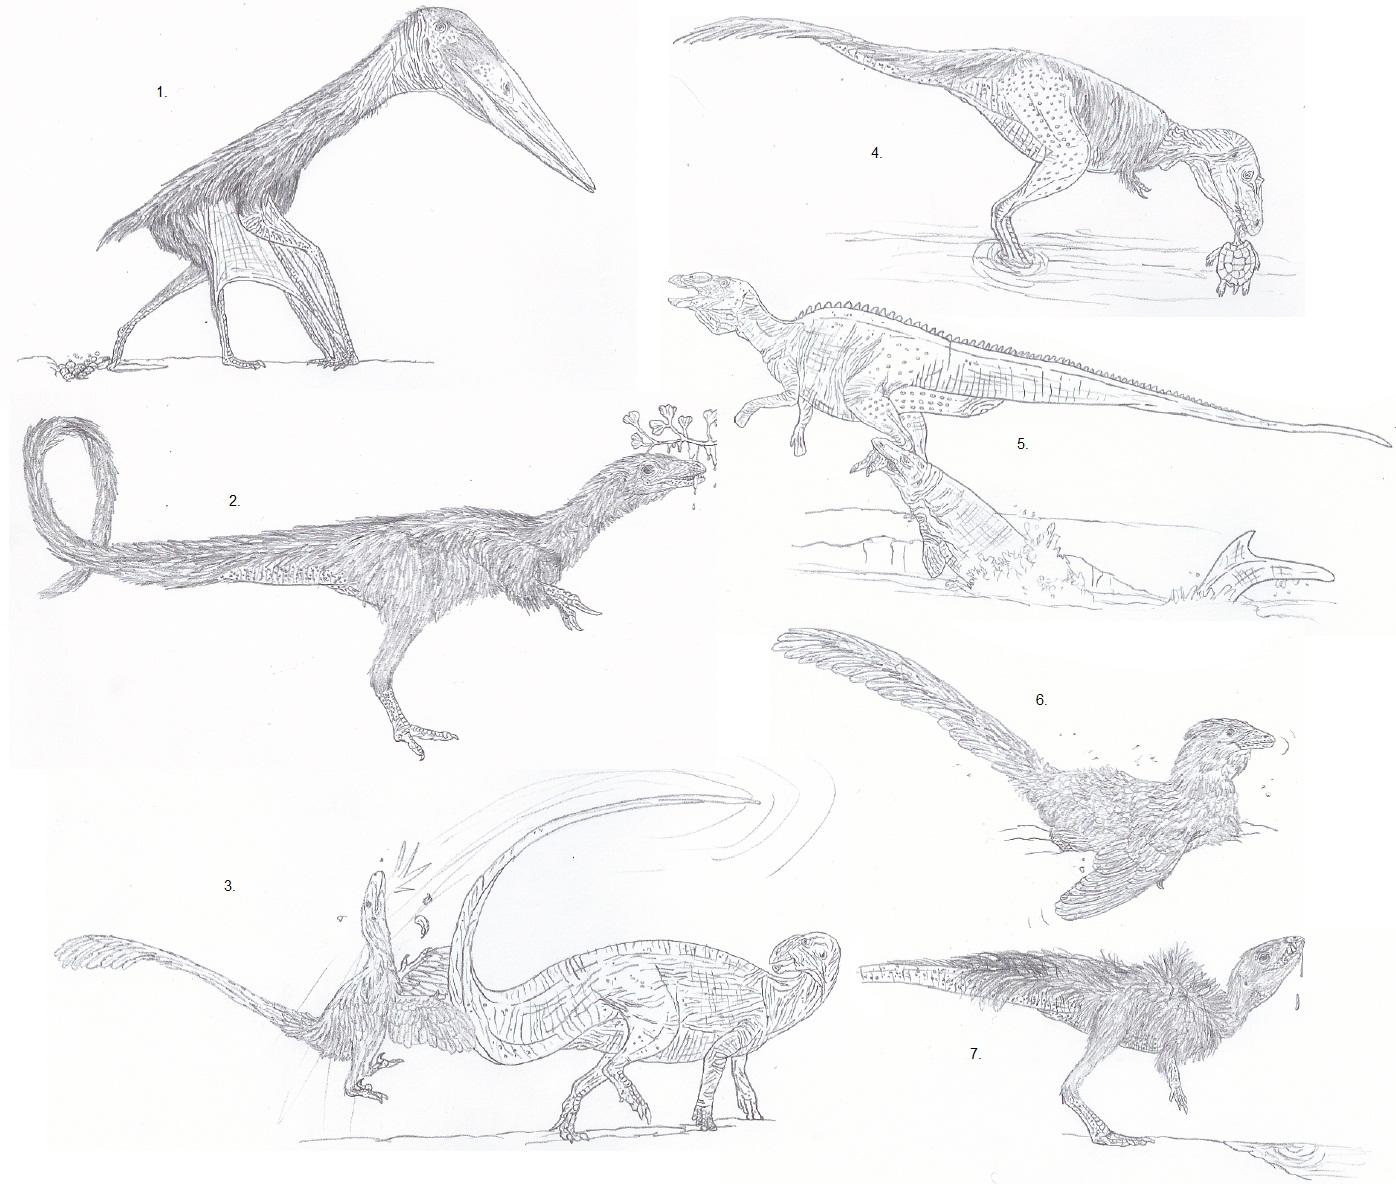 Uncommon Scenes in Paleo-Art by Tomozaurus